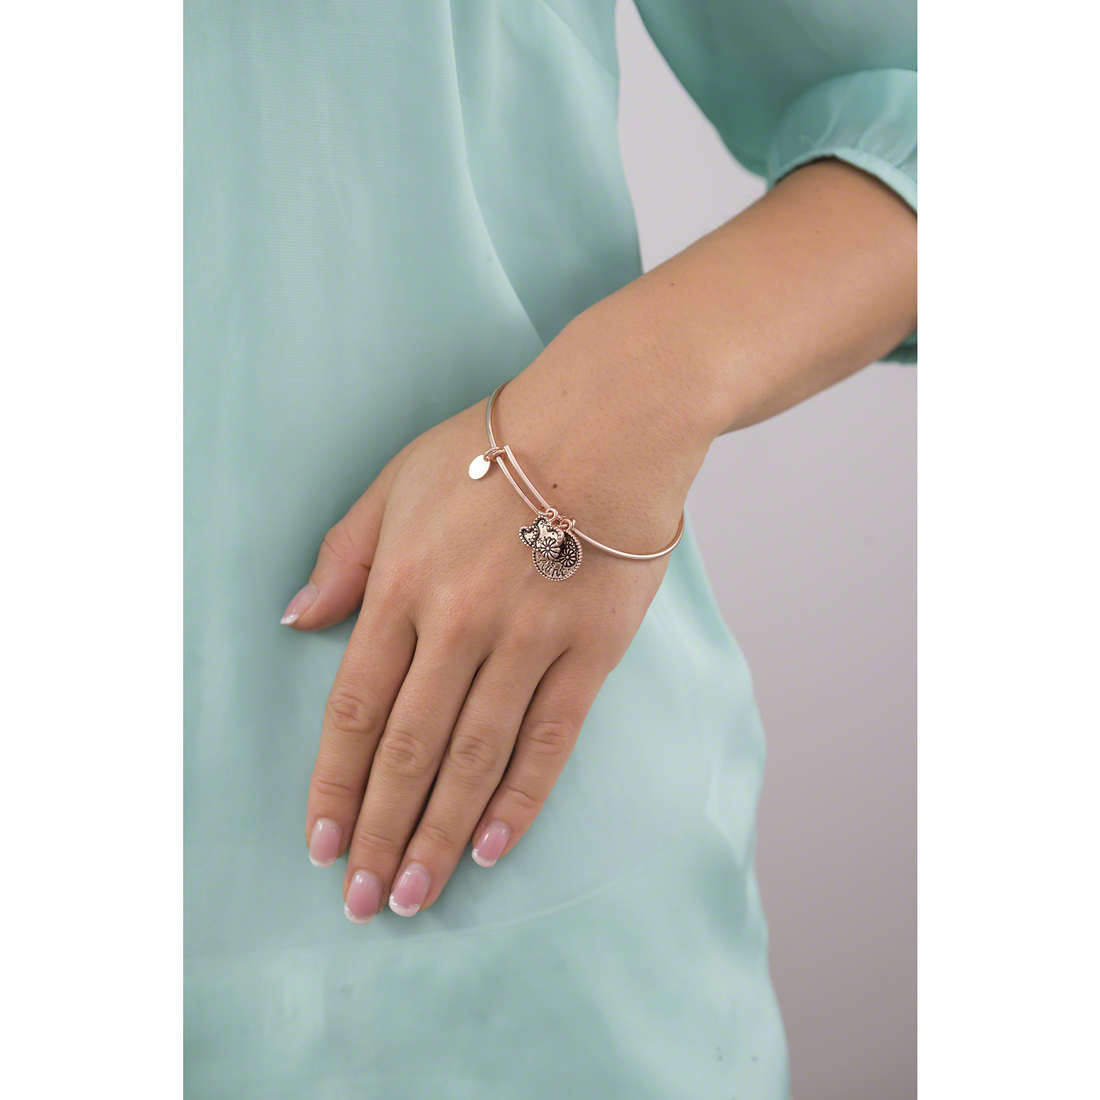 Chrysalis bracciali donna CRBT0706RG indosso